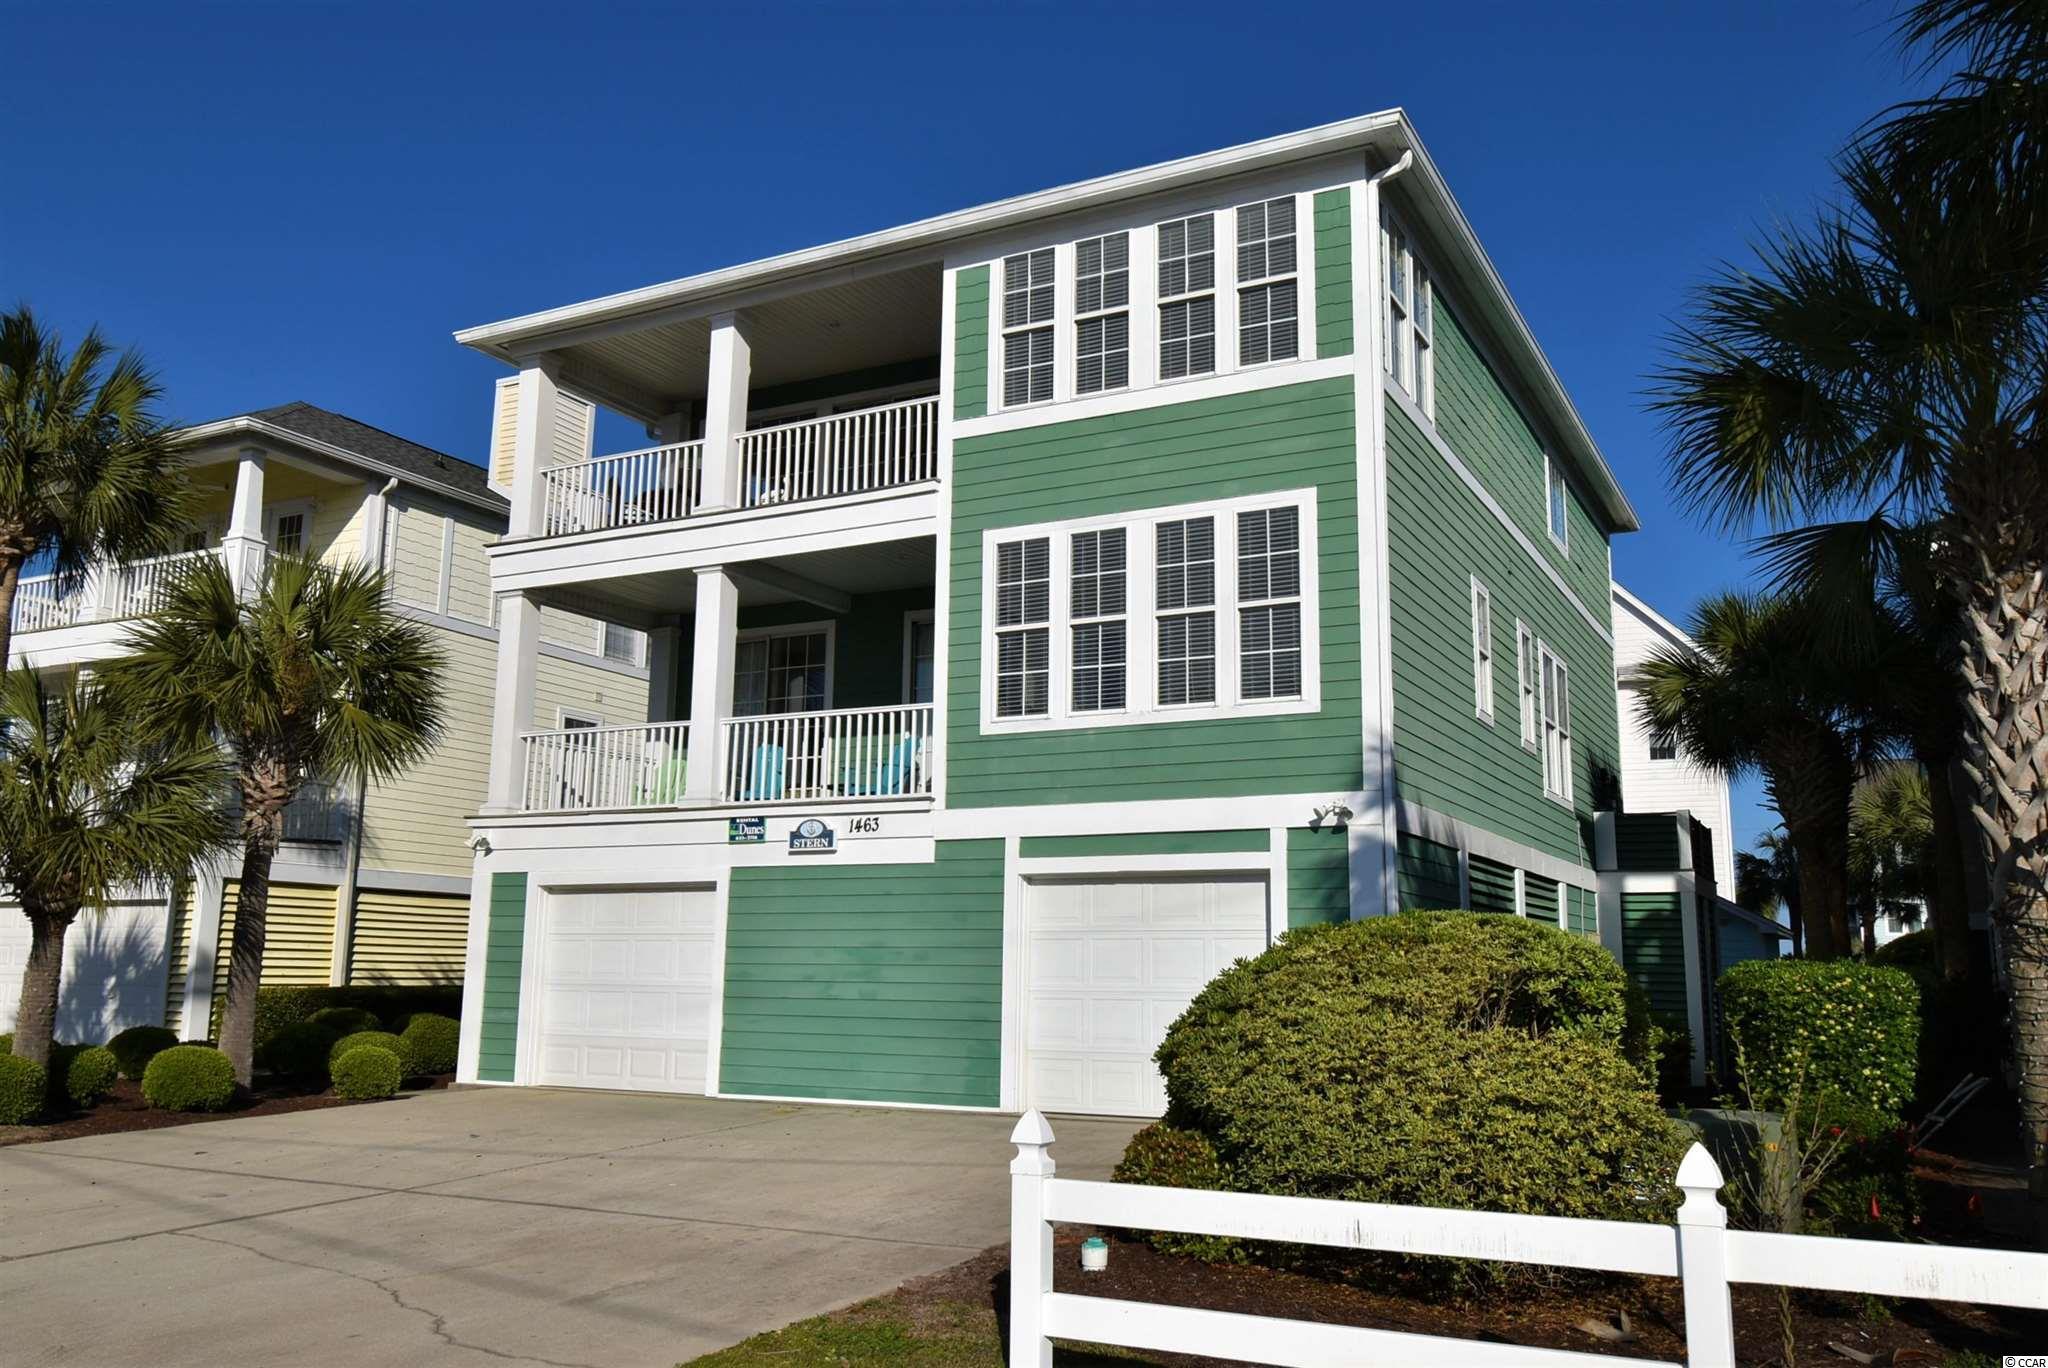 1463 Basin Terrace Property Photo 1